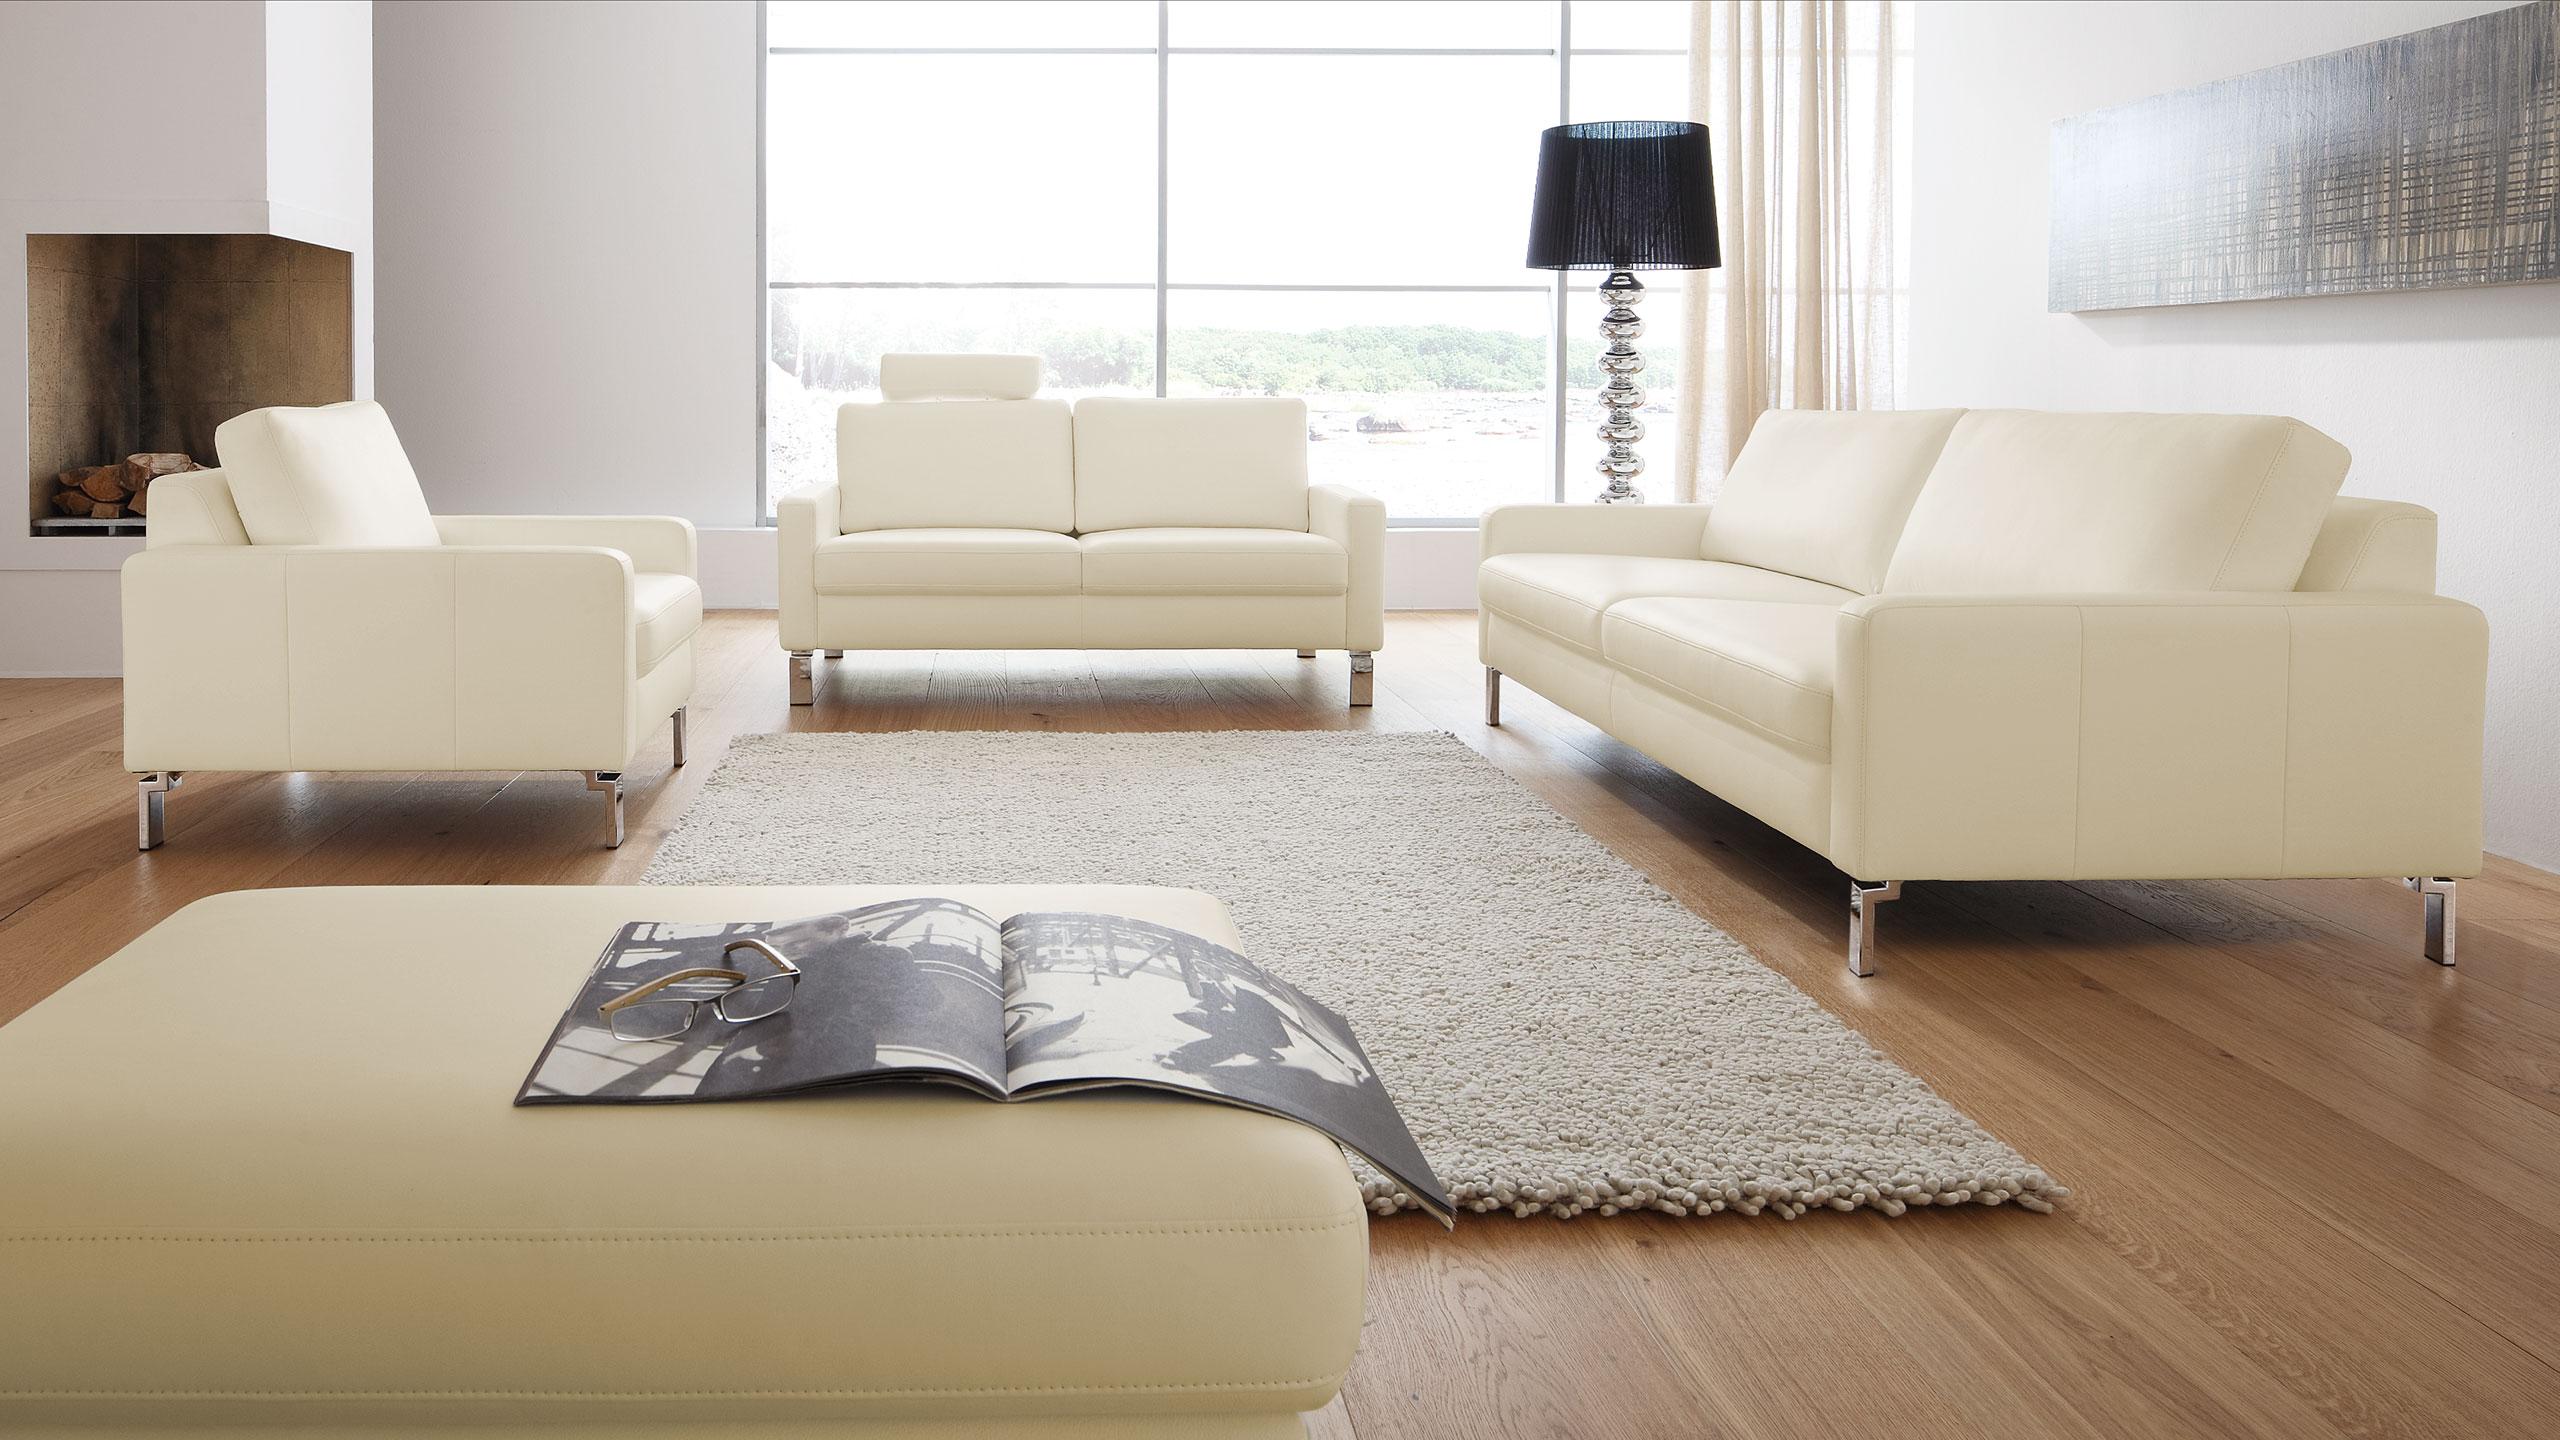 Indiana Sofa Garnitur Beige